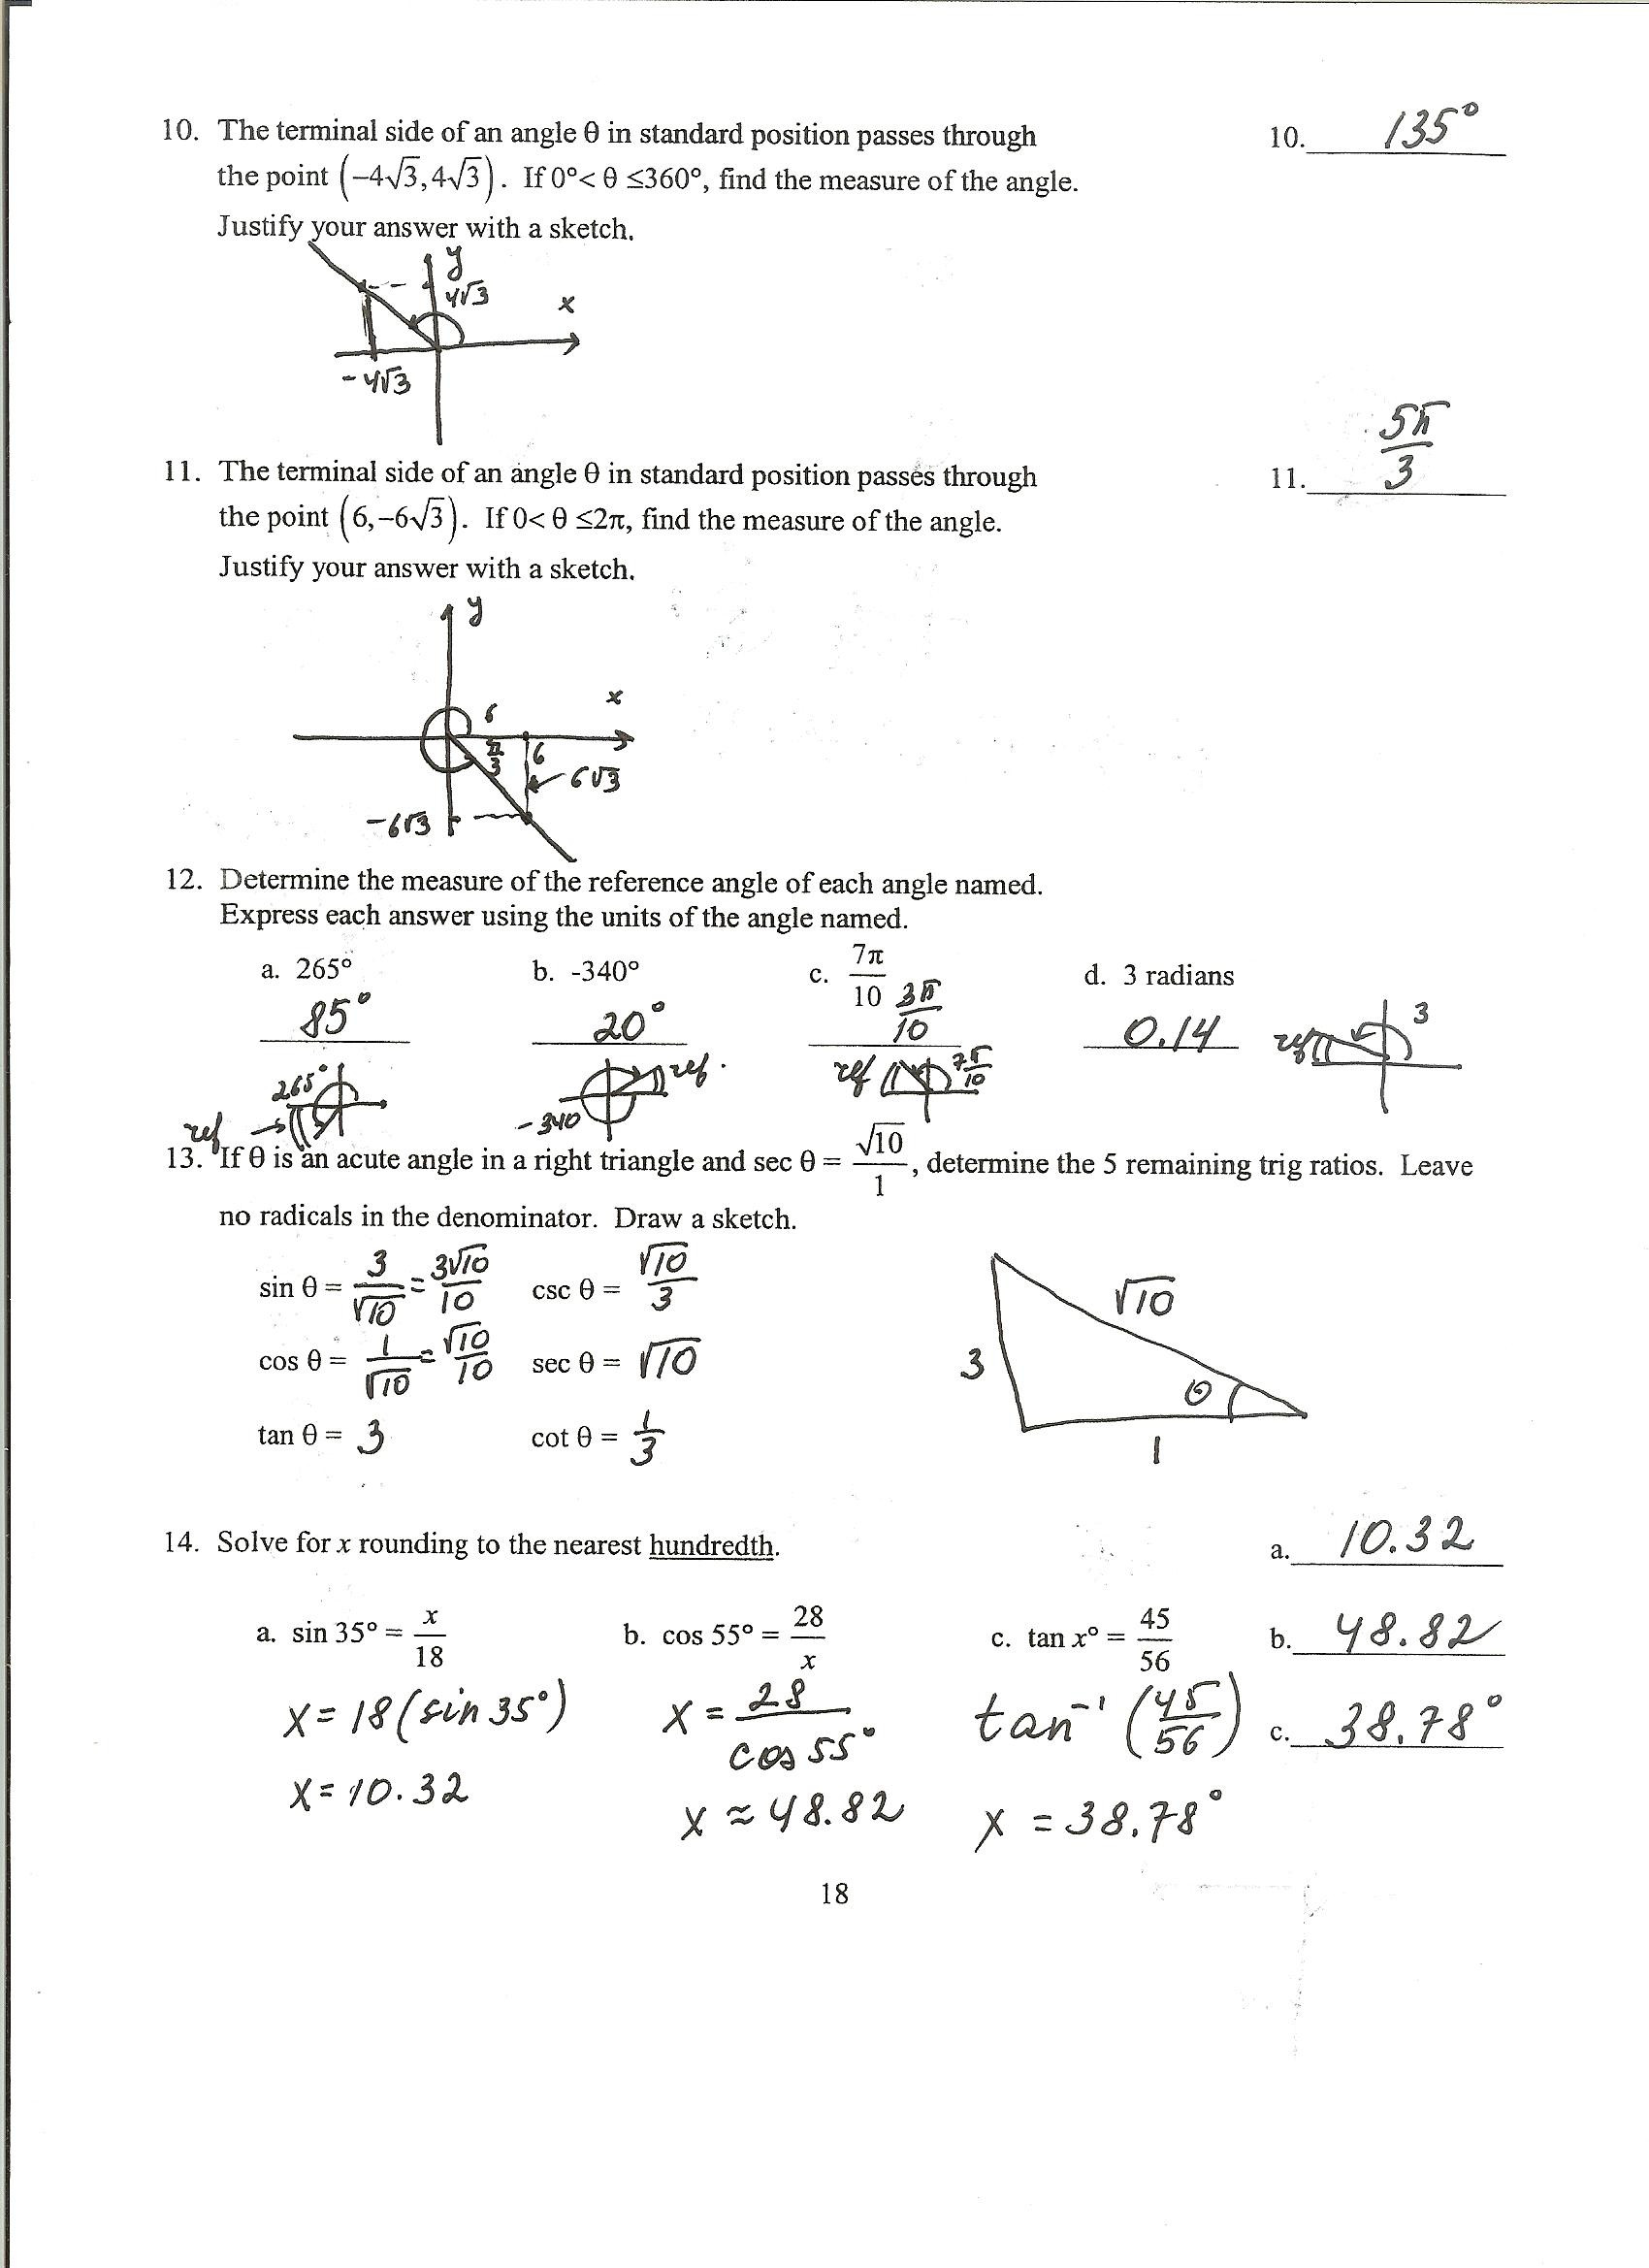 Solve Trig Equations Worksheet solving Trigonometric Equations Worksheet Part 2 Answers